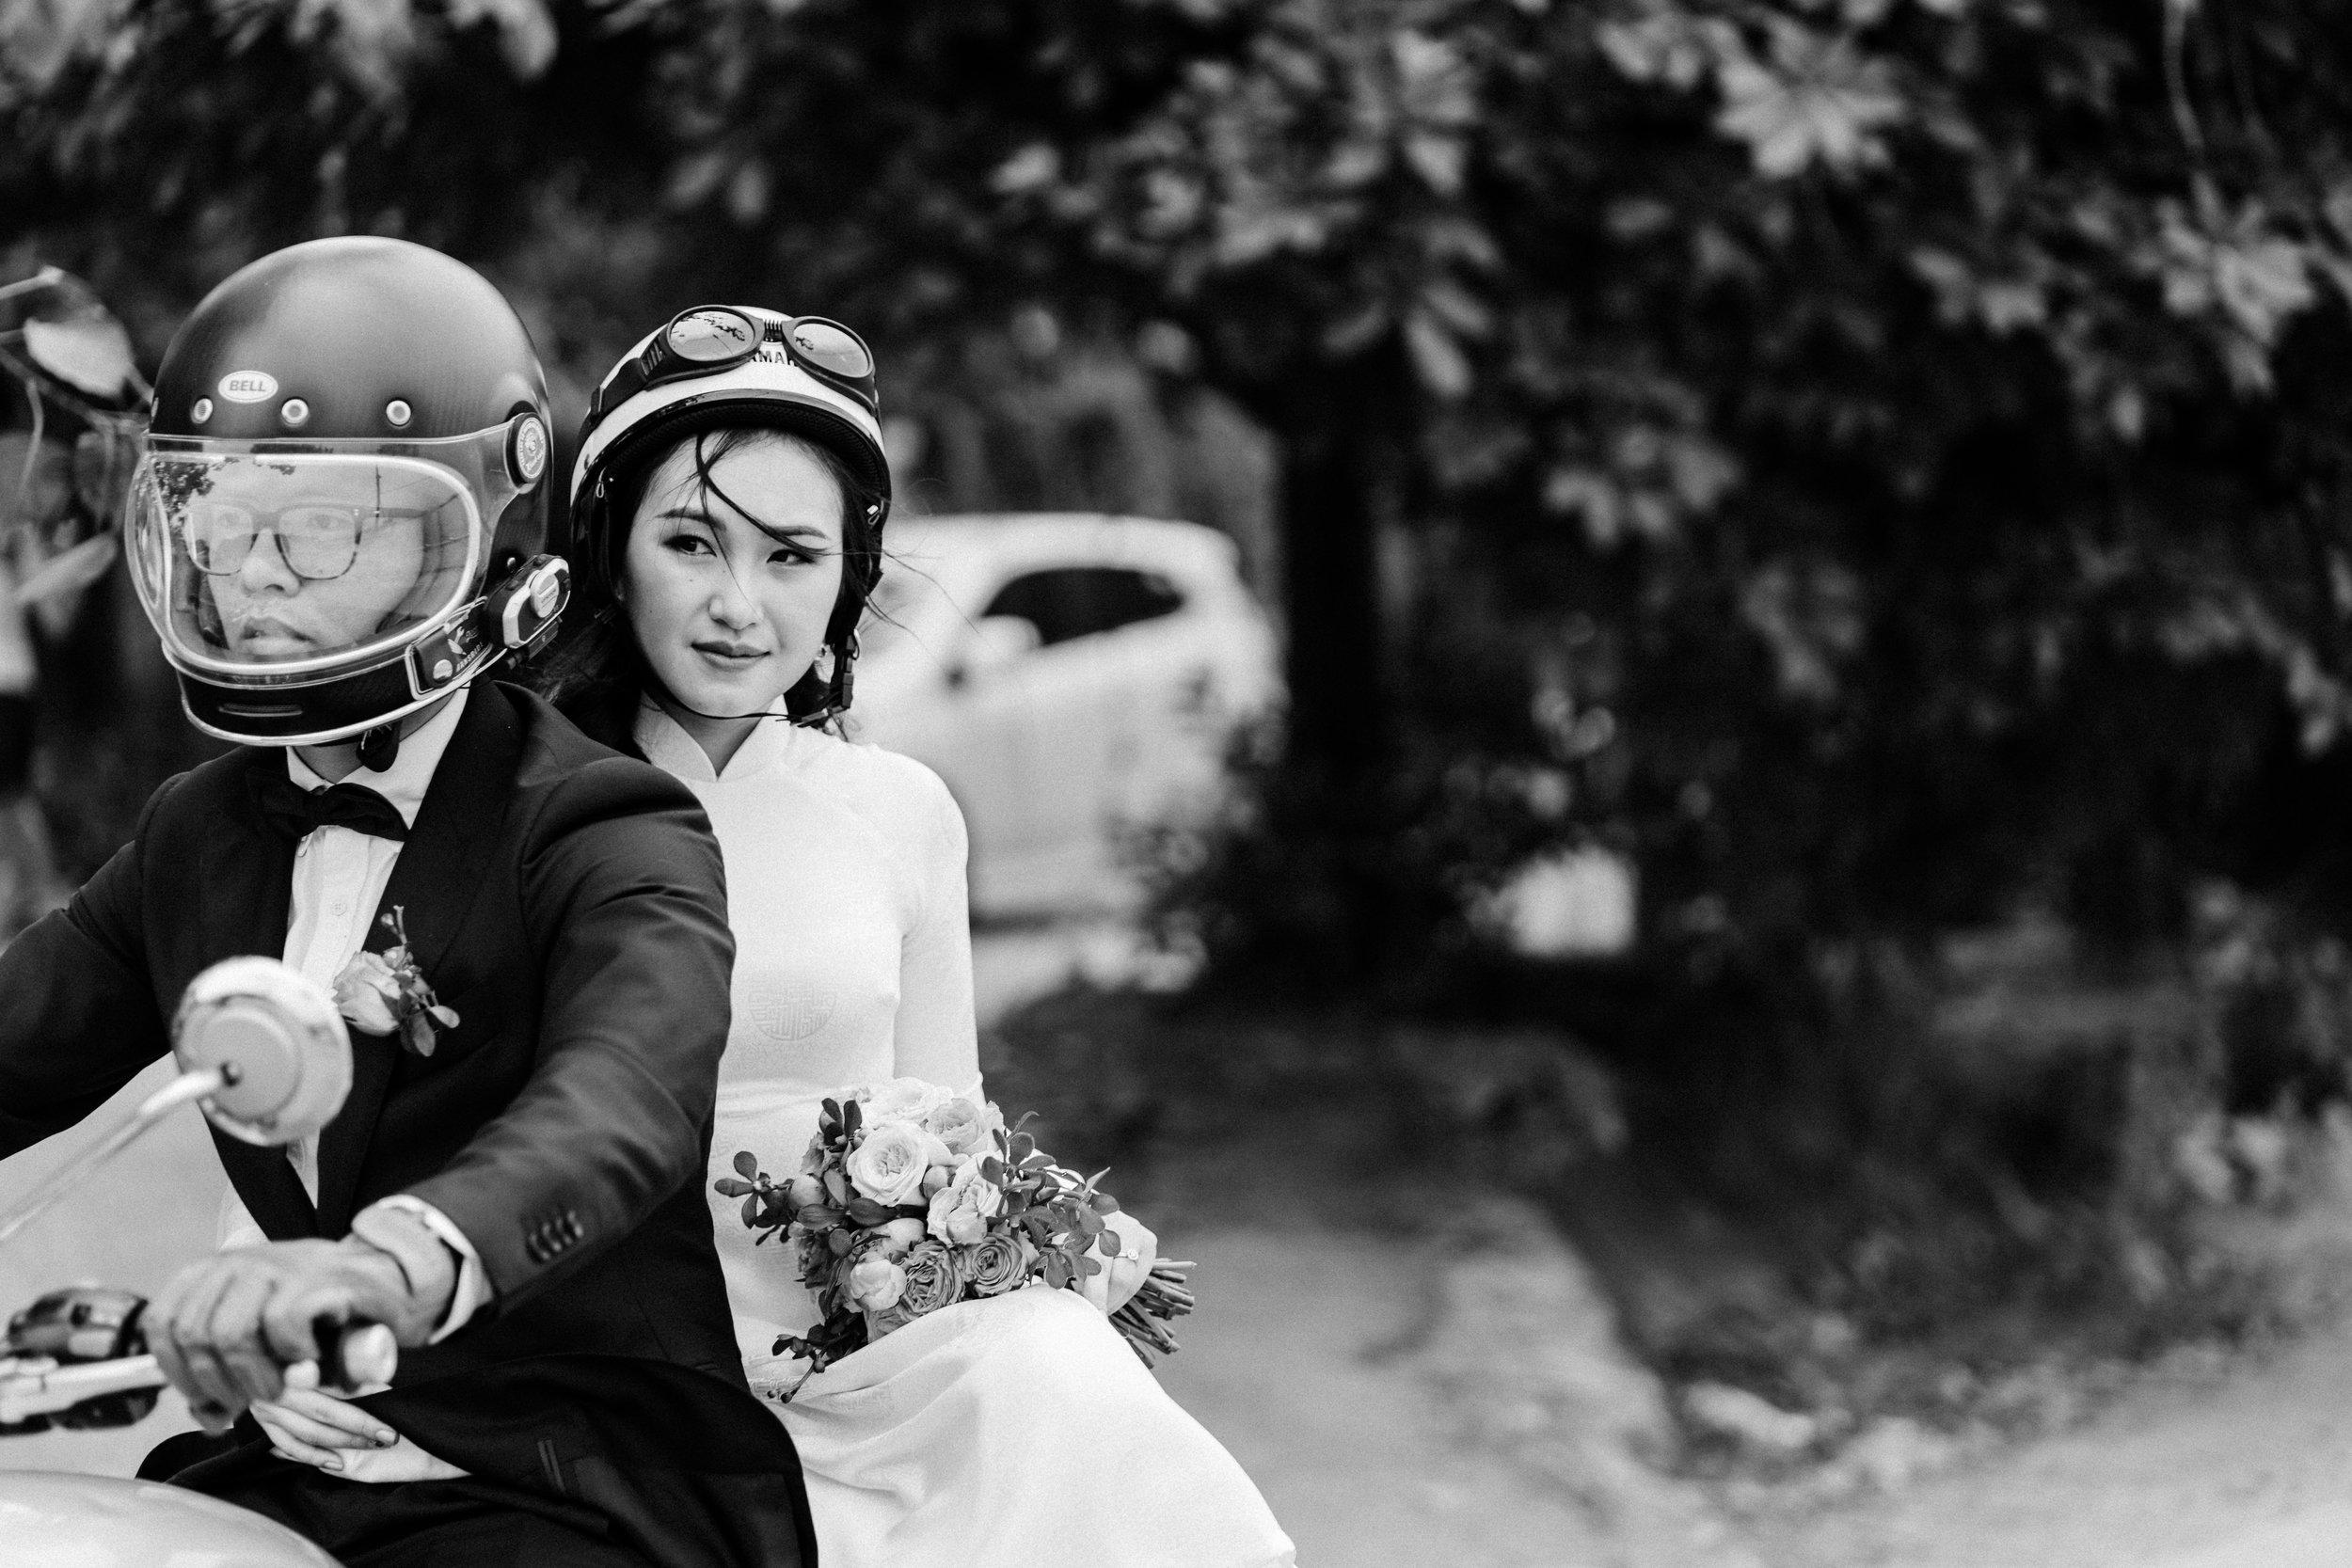 Mirrorwedding Destination Photographer TopofHanoi Duc Anh Hien Trang 095926.jpg